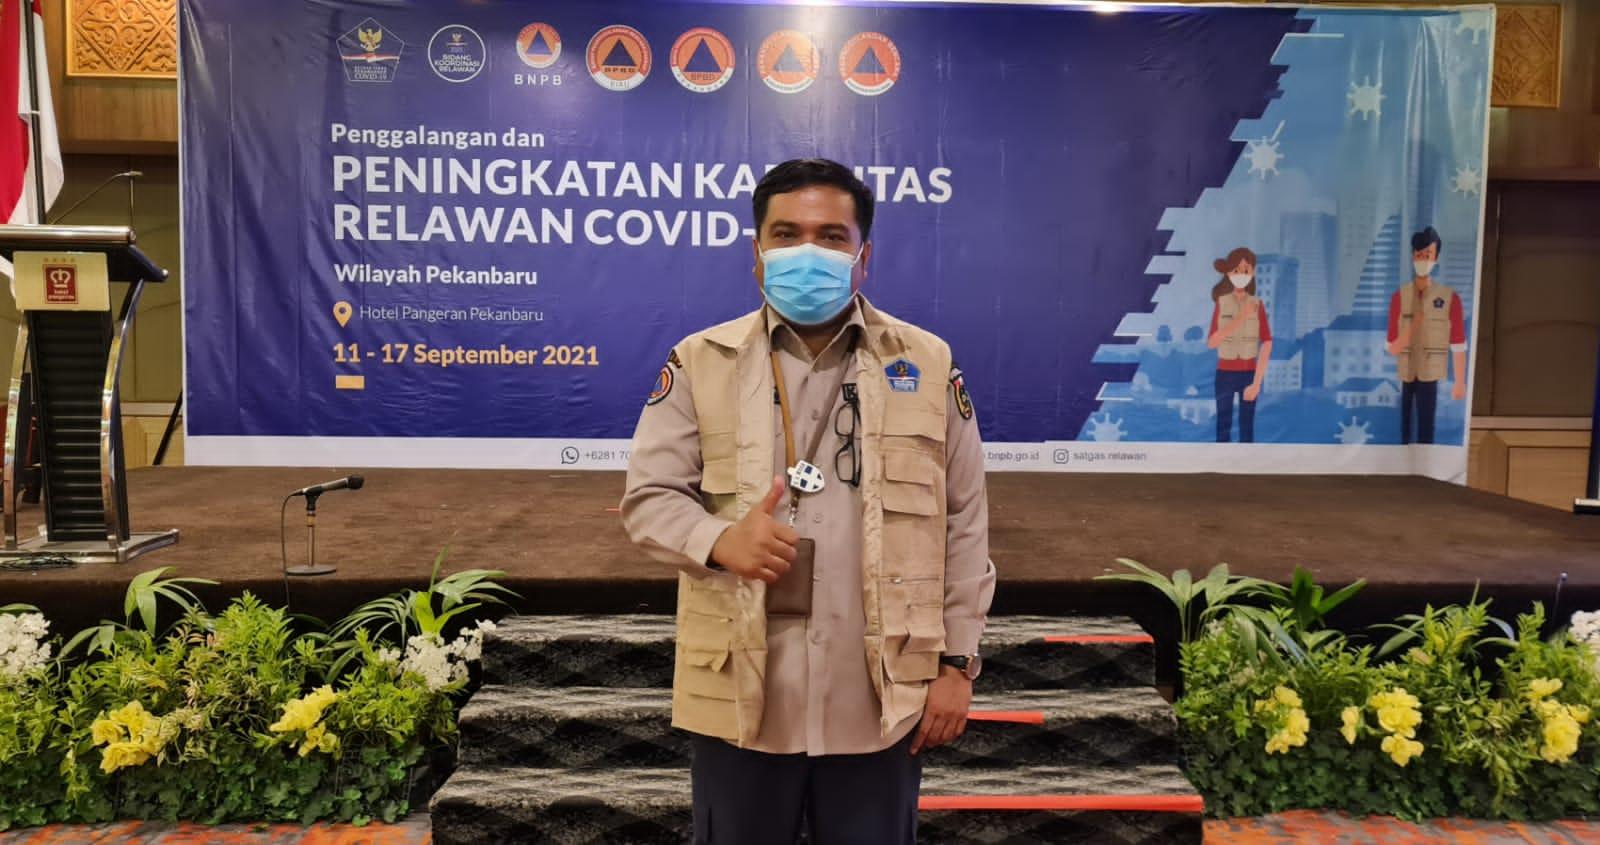 Image : Kalaksa BPBD Sosialisasi Penanganan Covid-19 ke Relawan